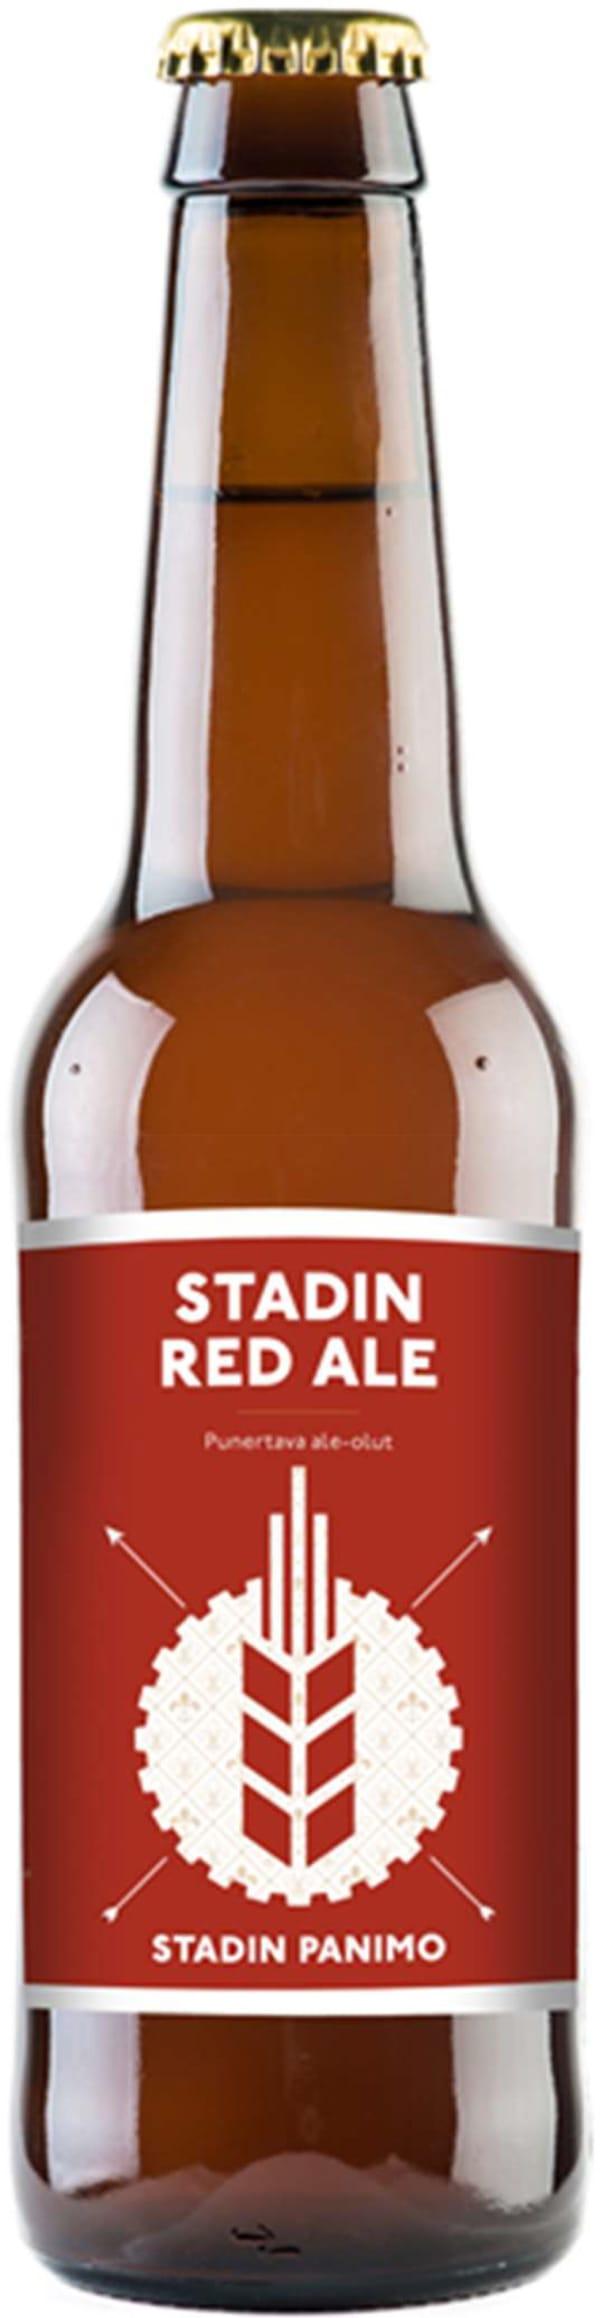 Stadin Red Ale